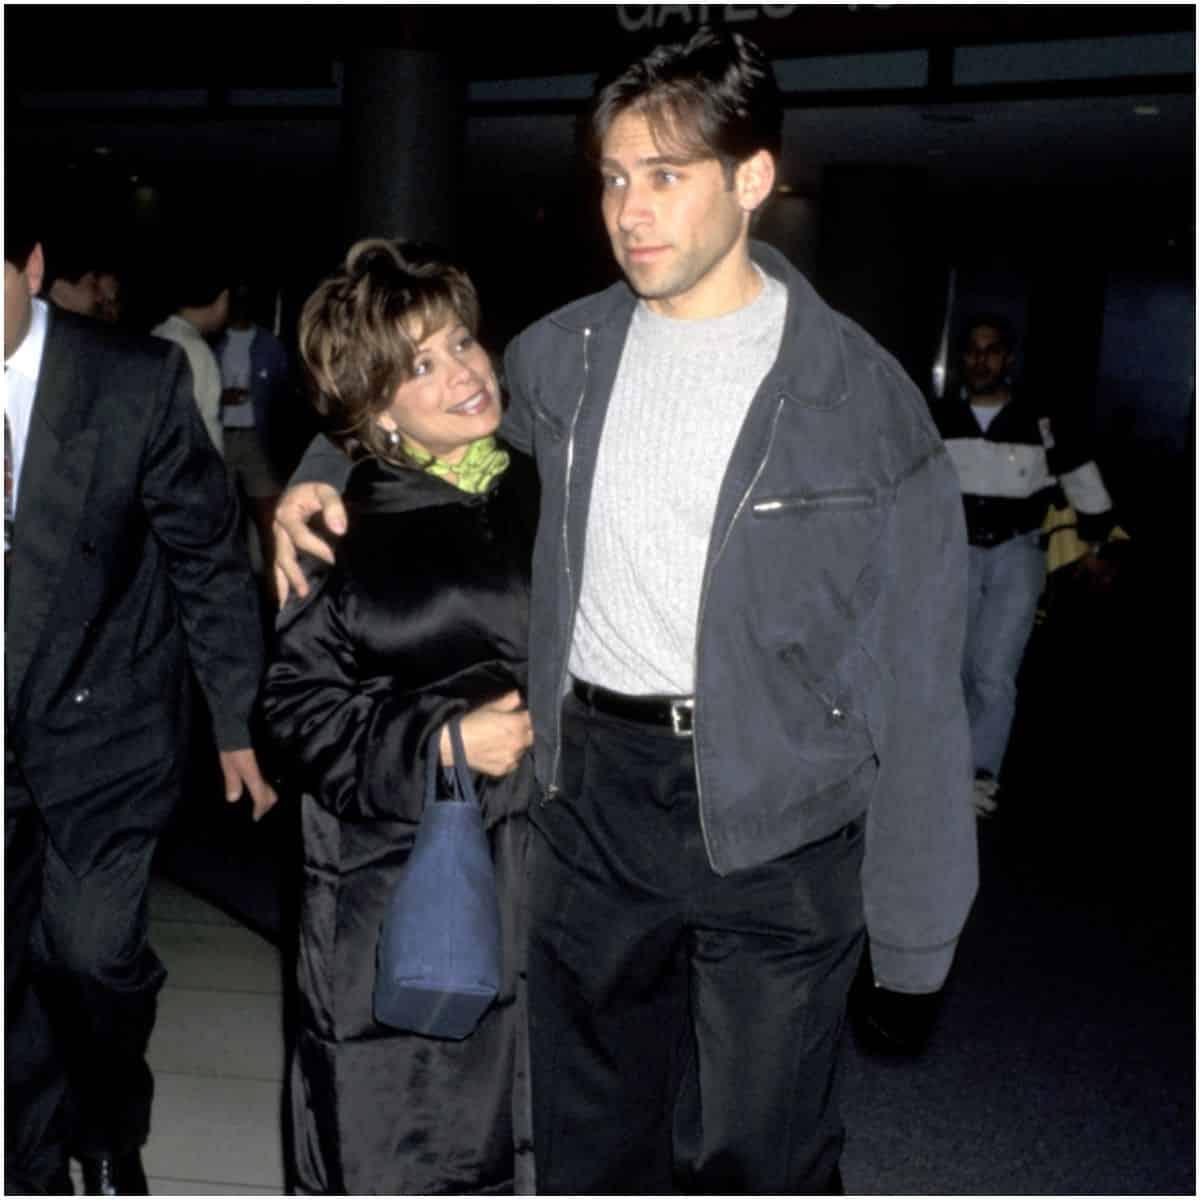 Paula Abdul with husband Brad Beckerman